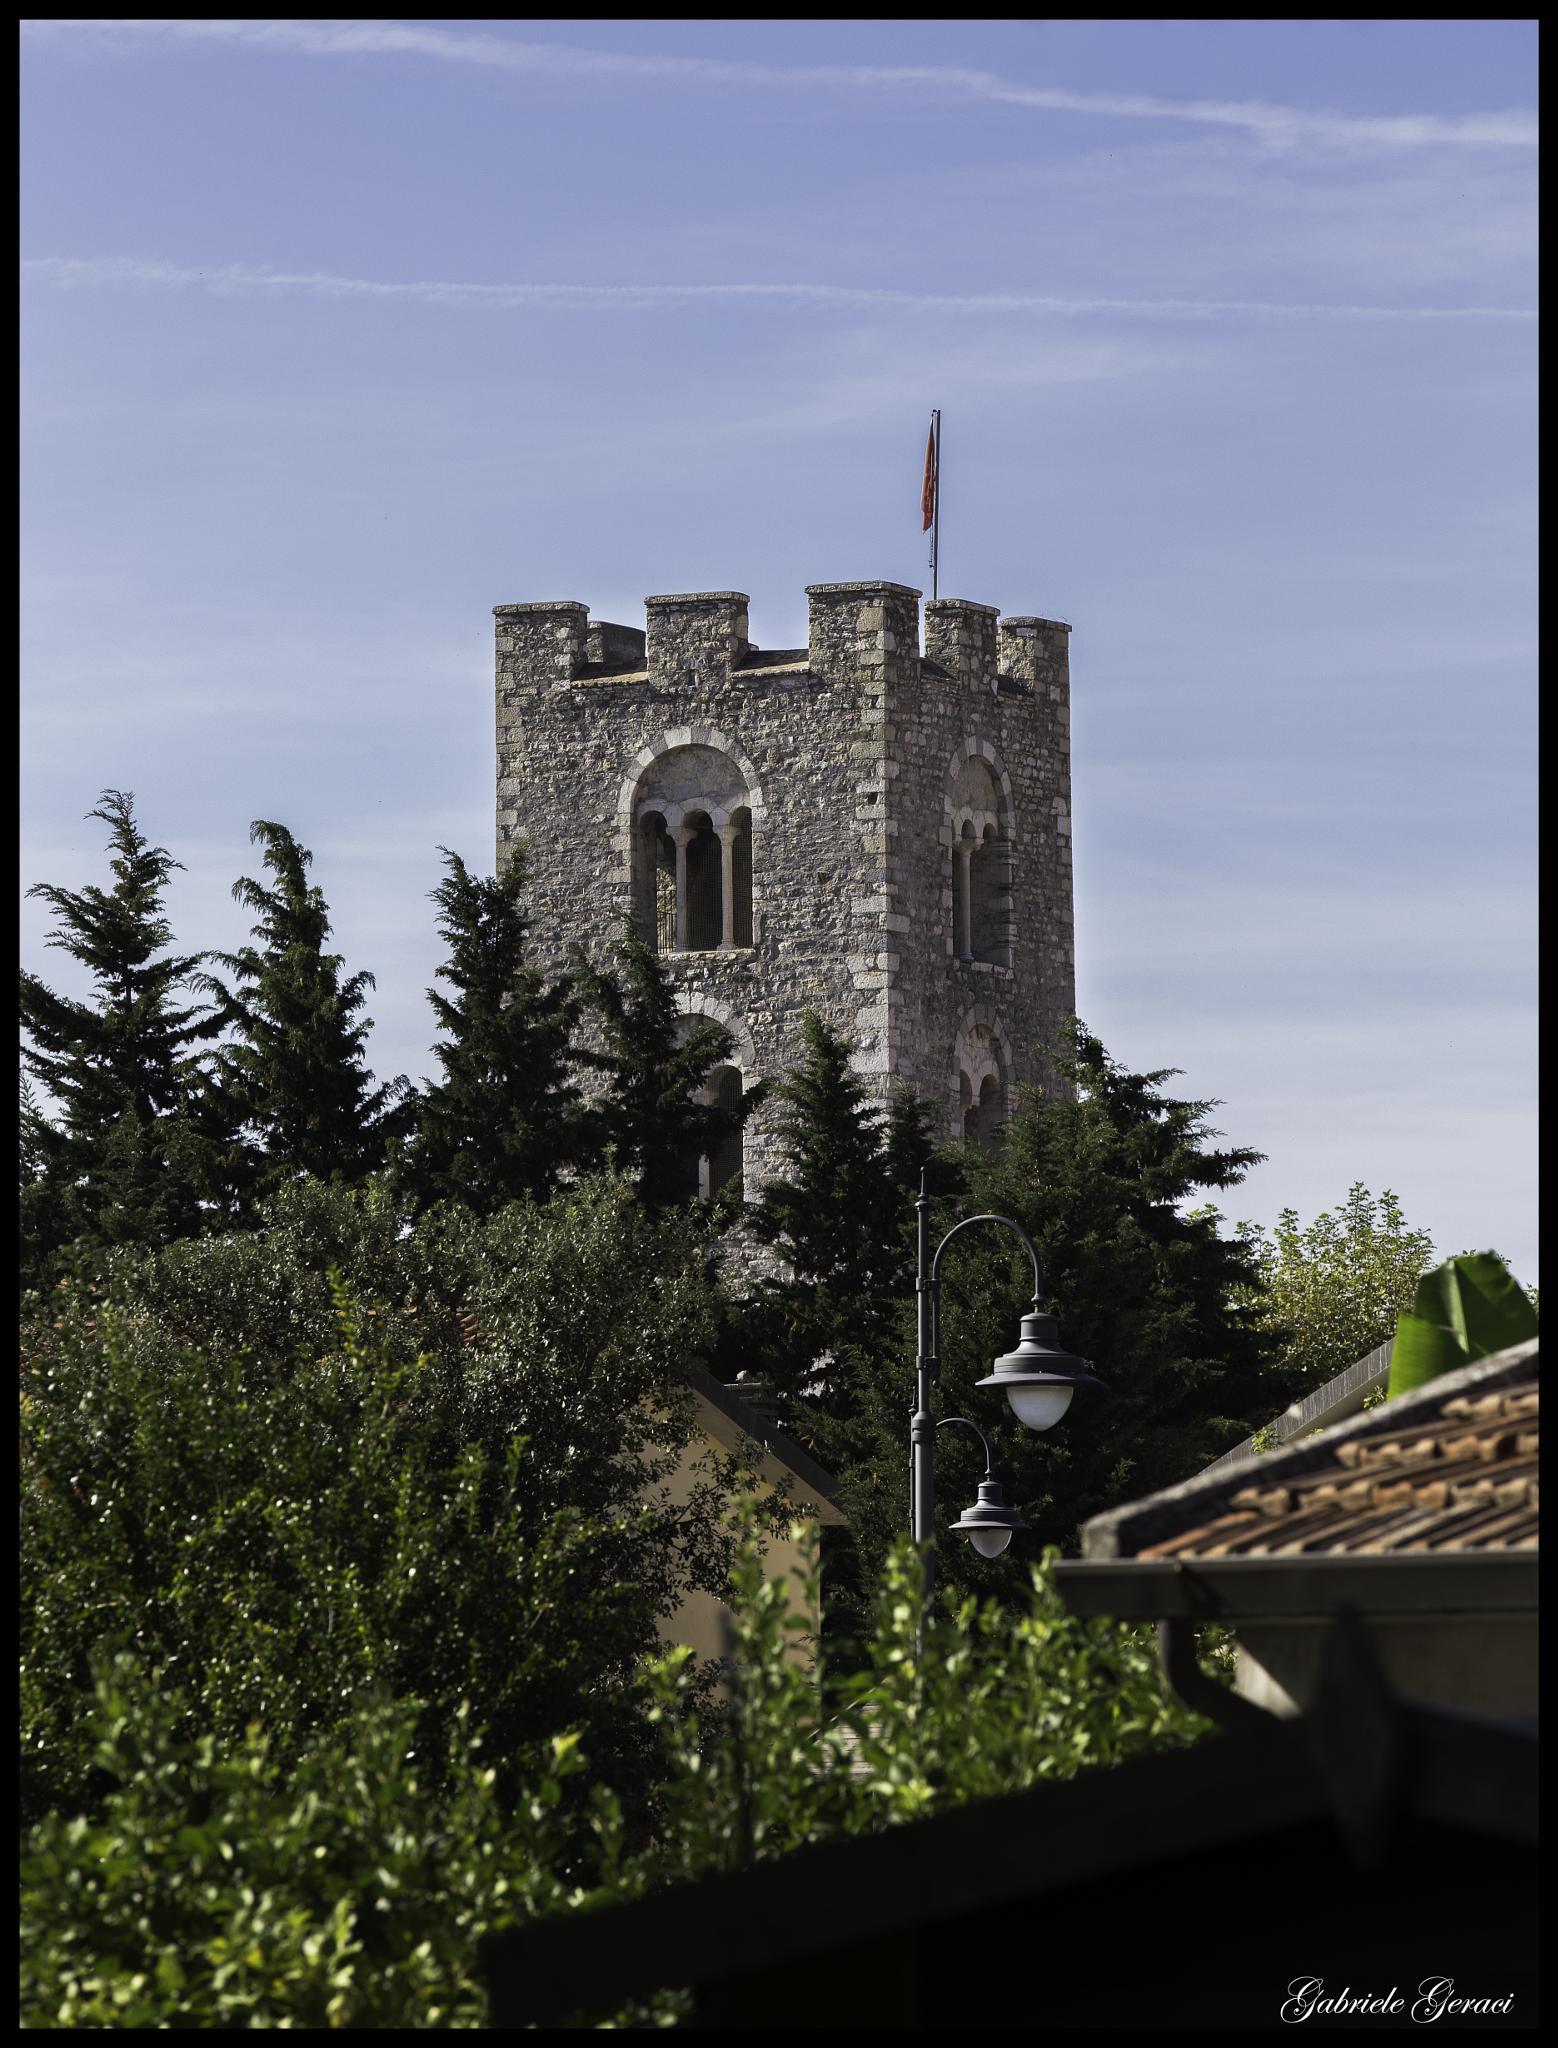 La Torre by Gabriele Geraci